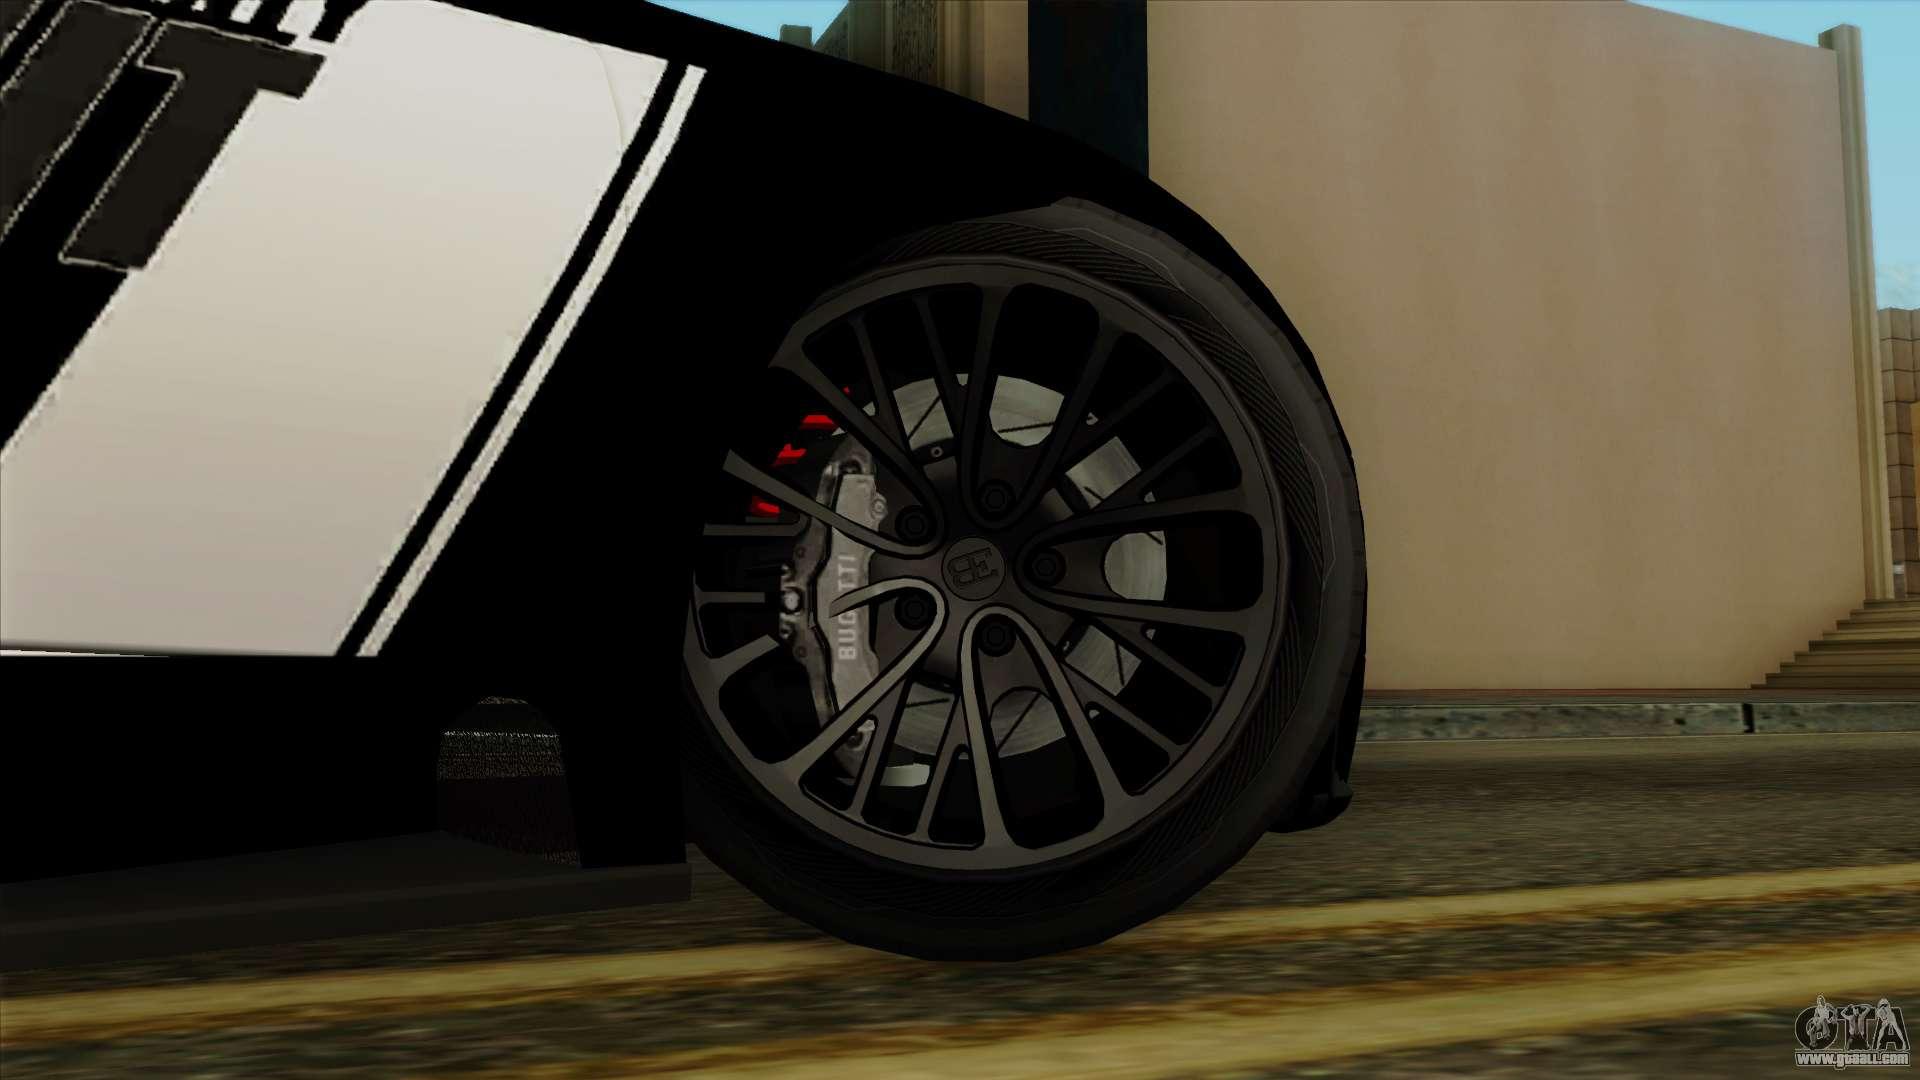 292131-gta-sa-2015-09-05-17-39-26-509 Terrific Bugatti Veyron Mod Gta Sa Cars Trend